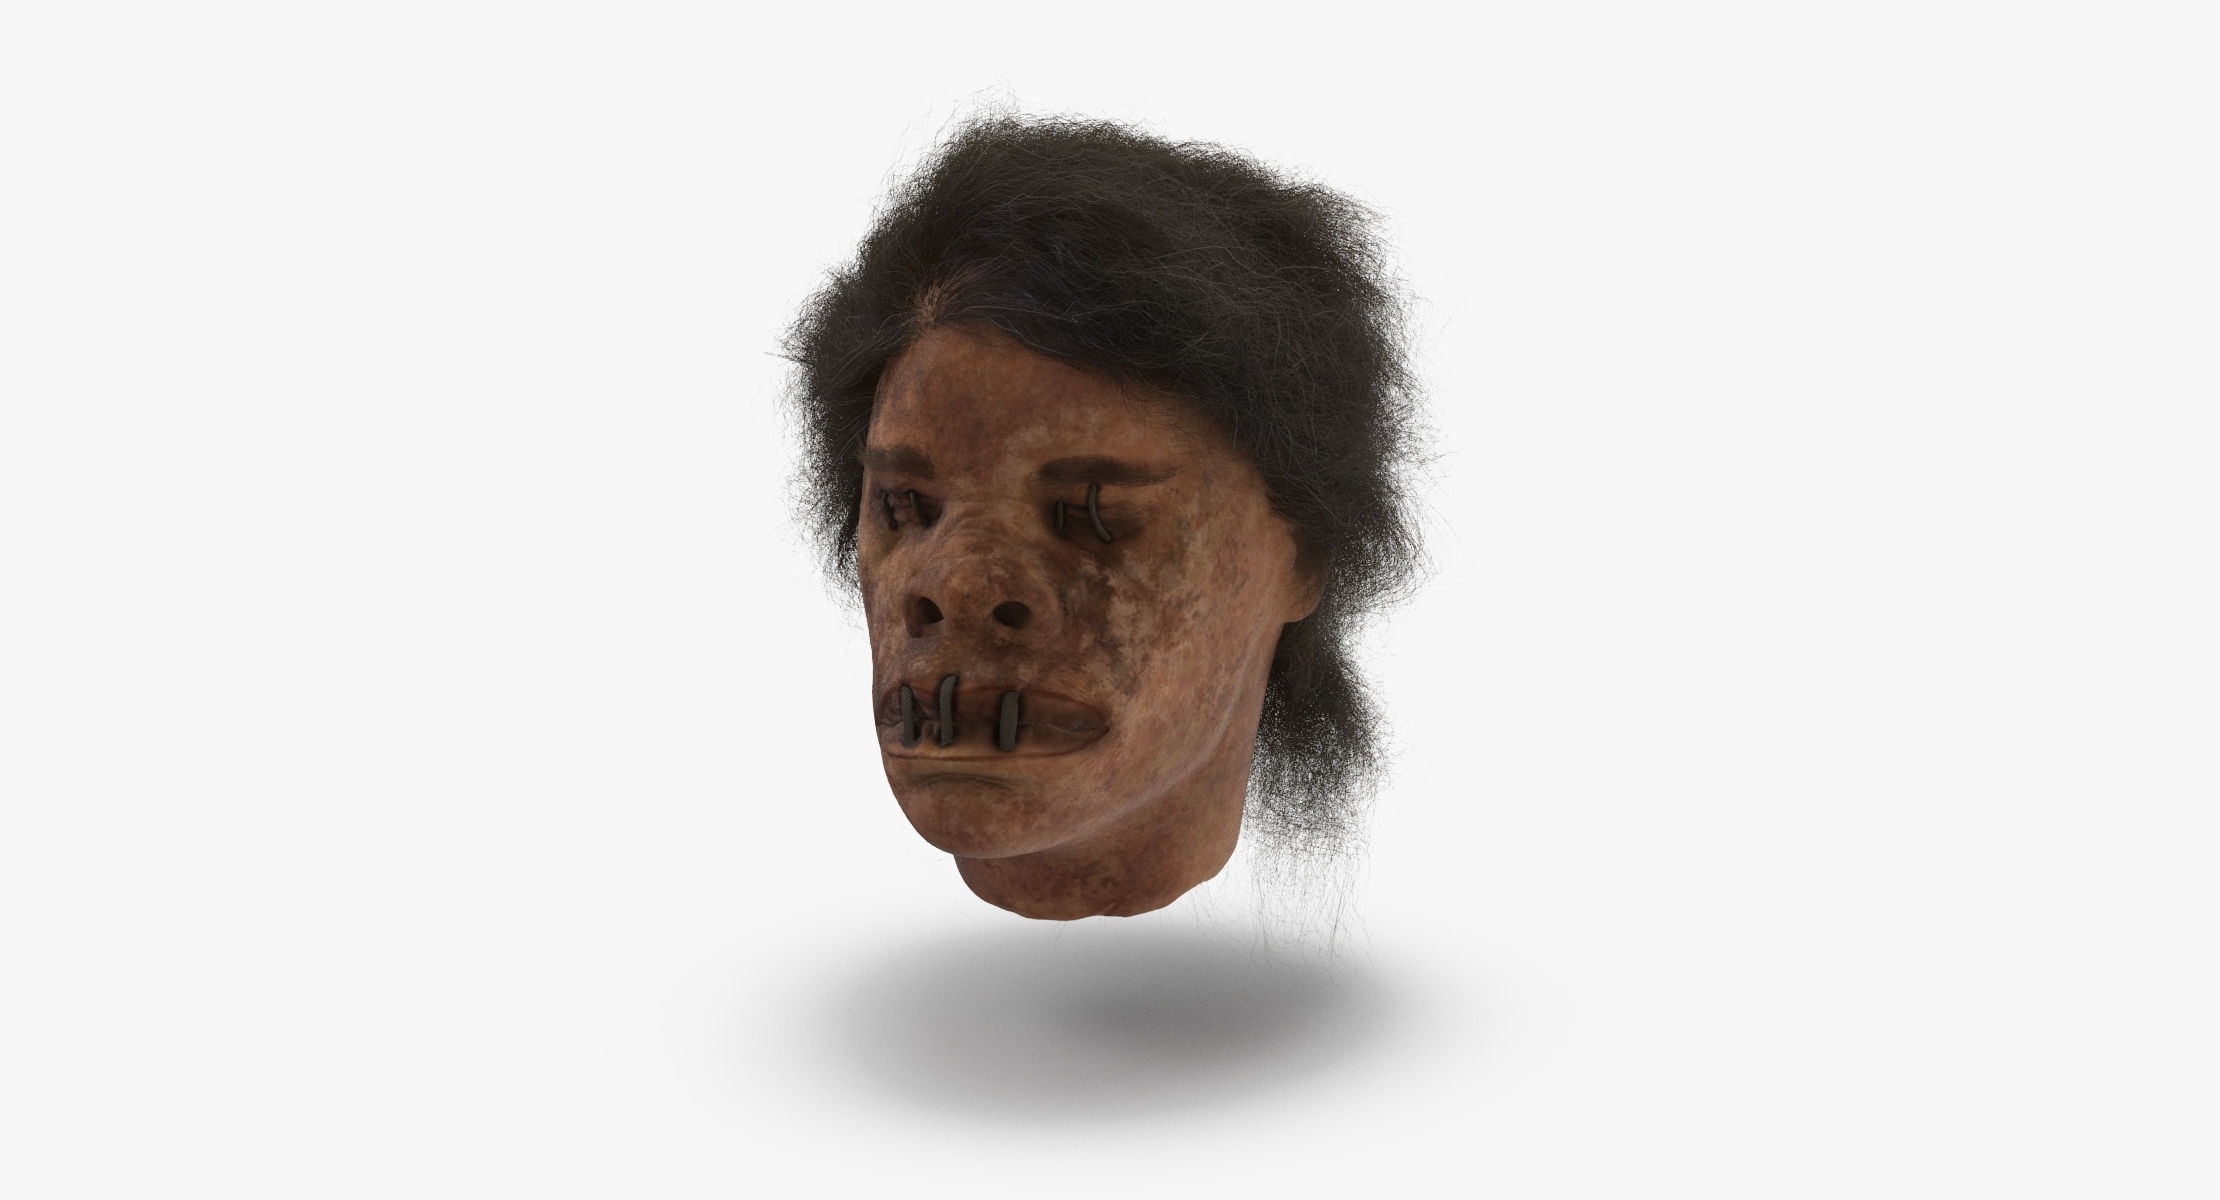 Shrunken Head 02 - reel 1